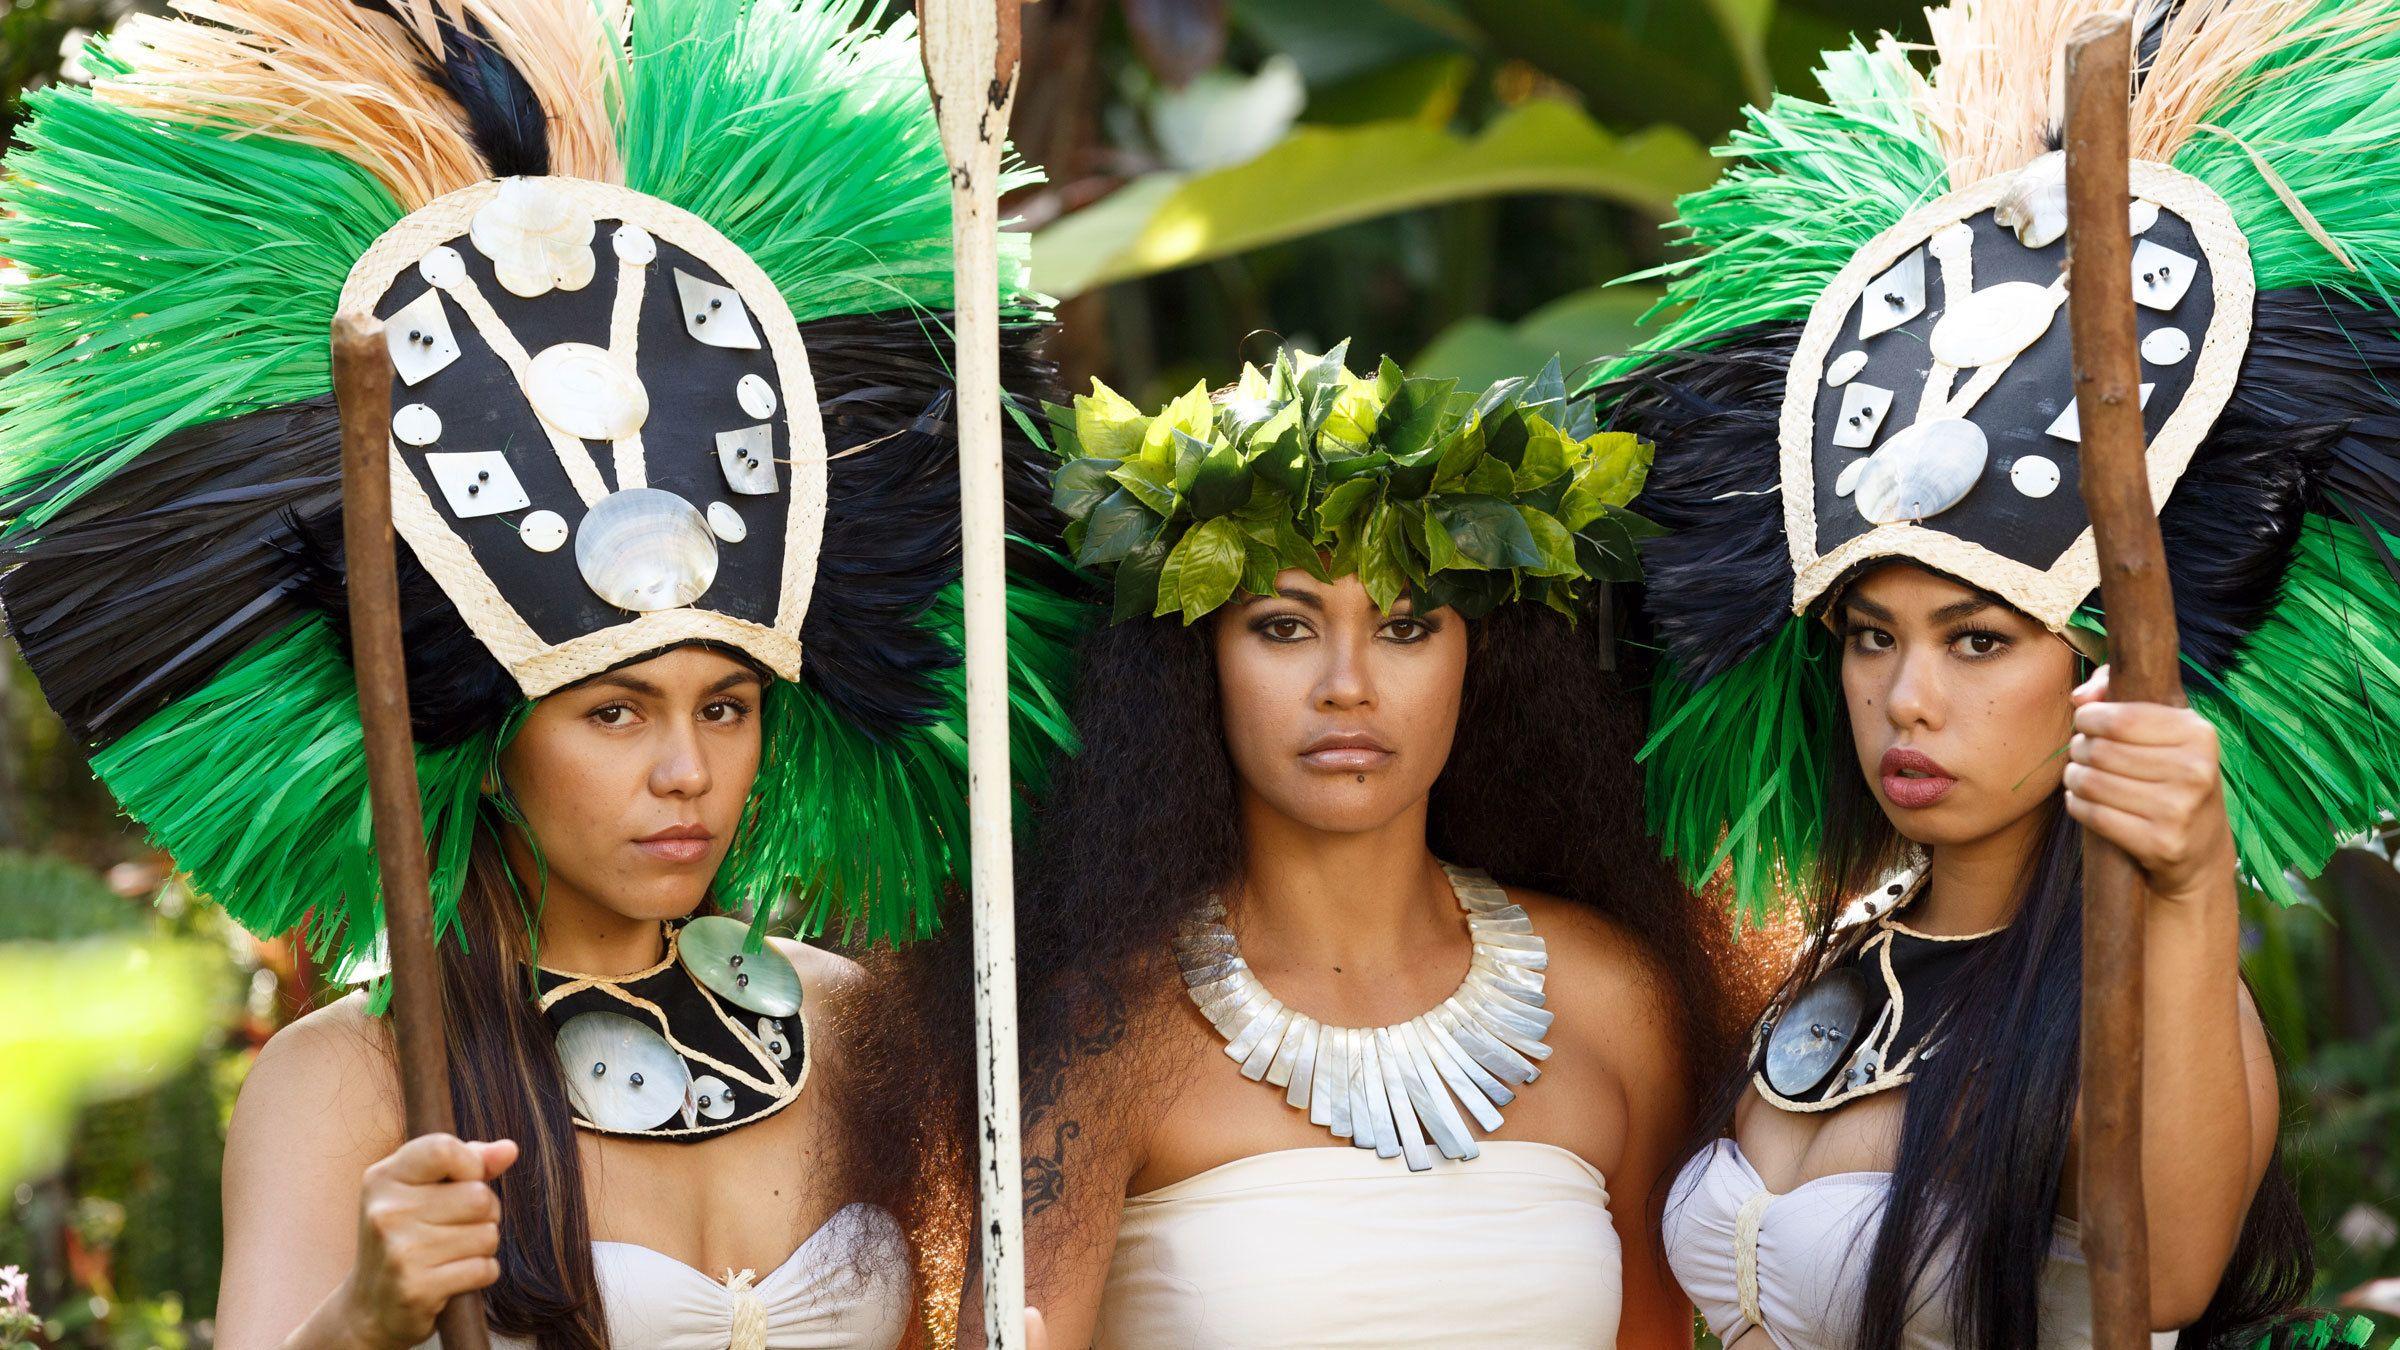 Three women in traditional island clothing in Kauai